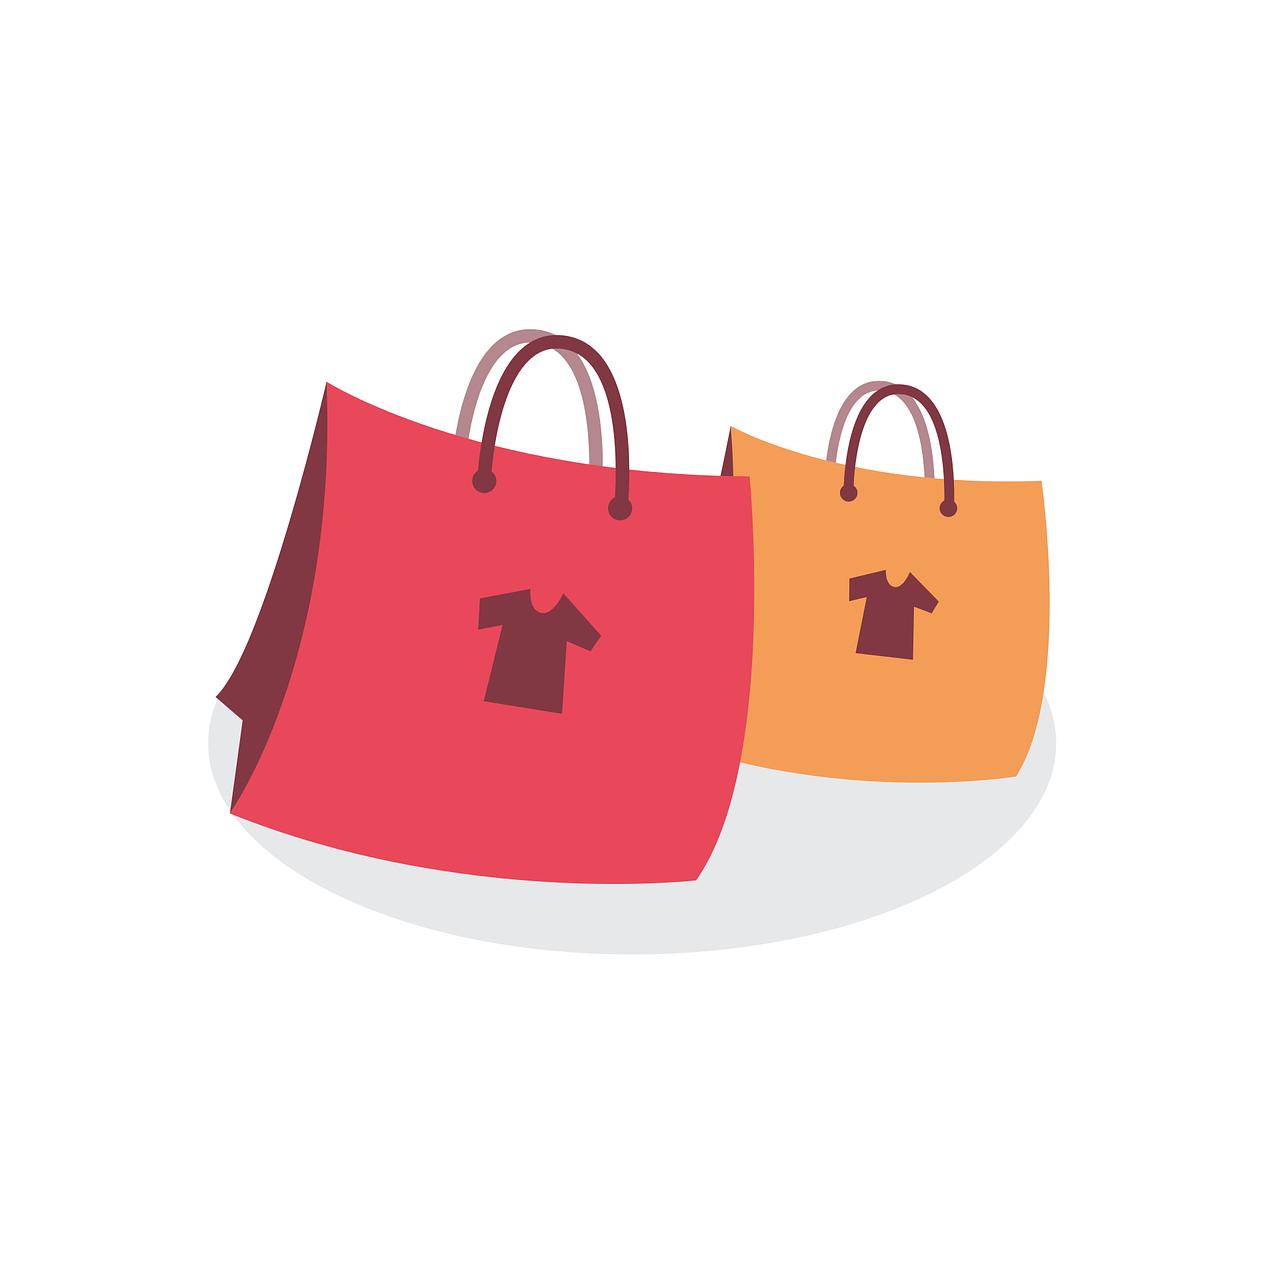 Shopify ou WooCommerce : Lequel choisir ?